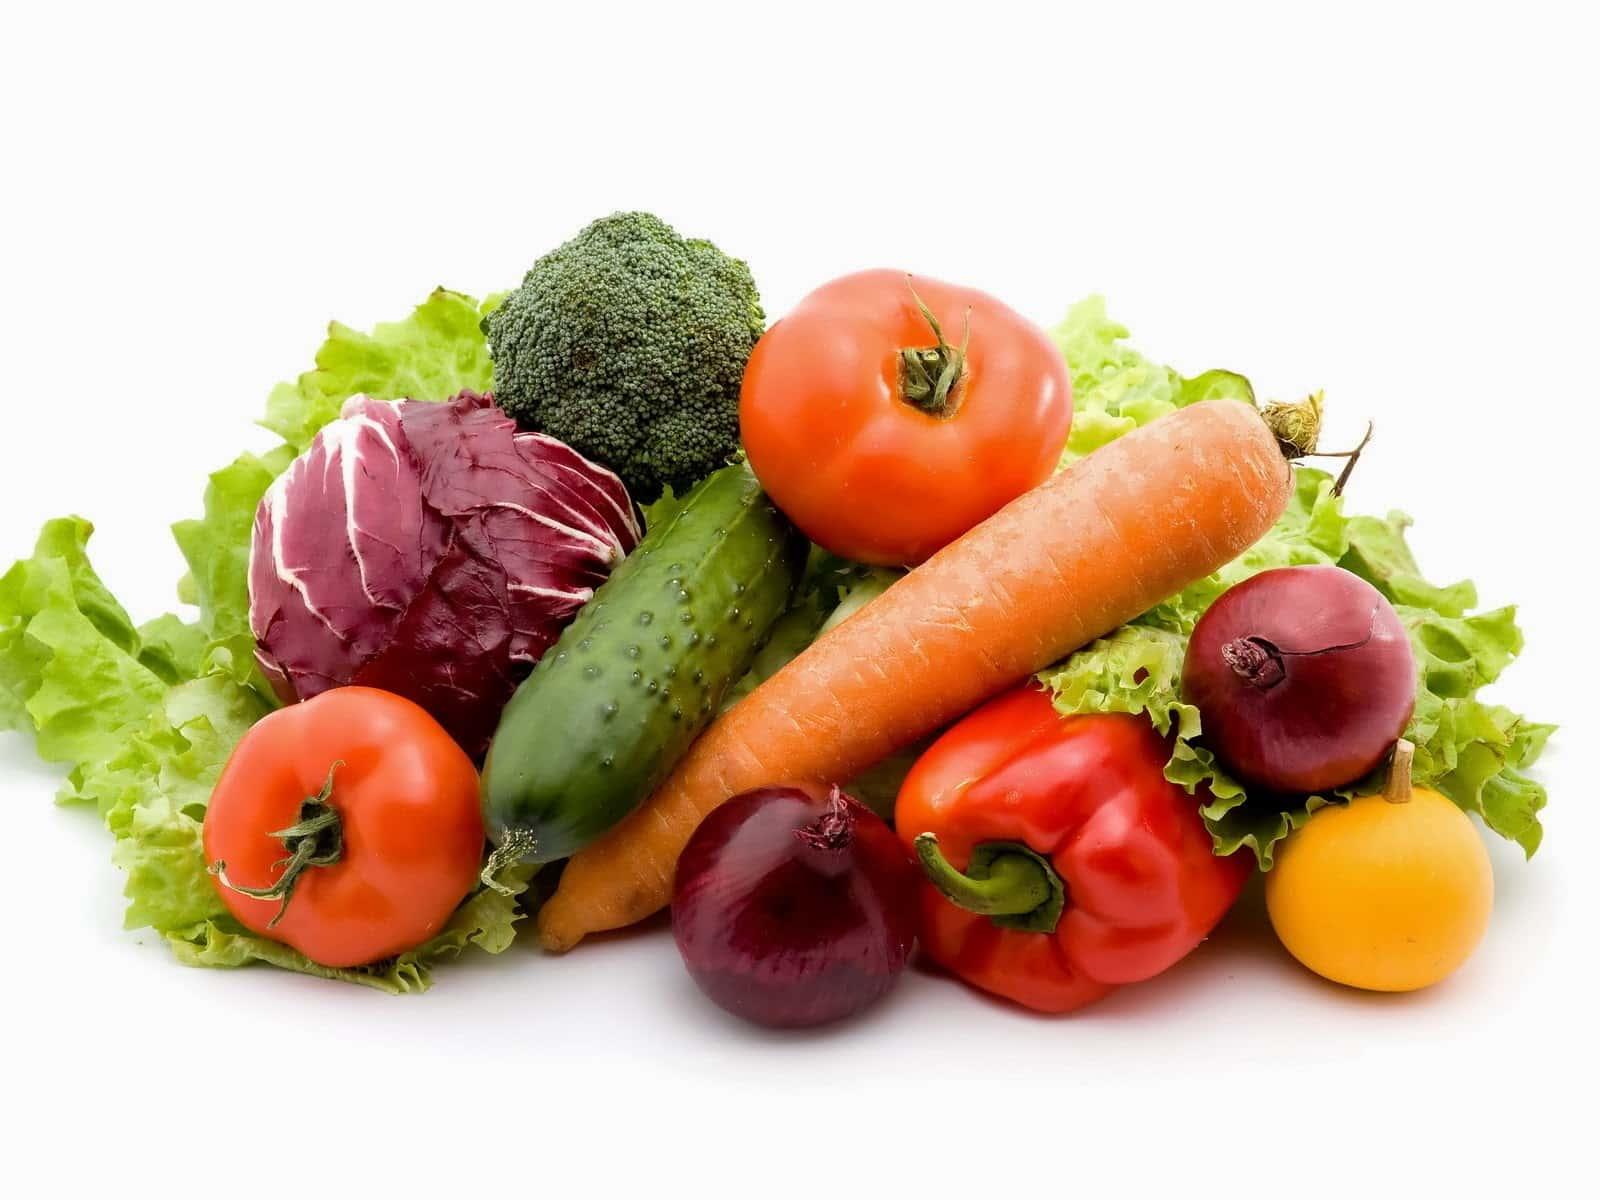 Curiosità sulle verdure - Curiosità sul cibo e curiosità golose